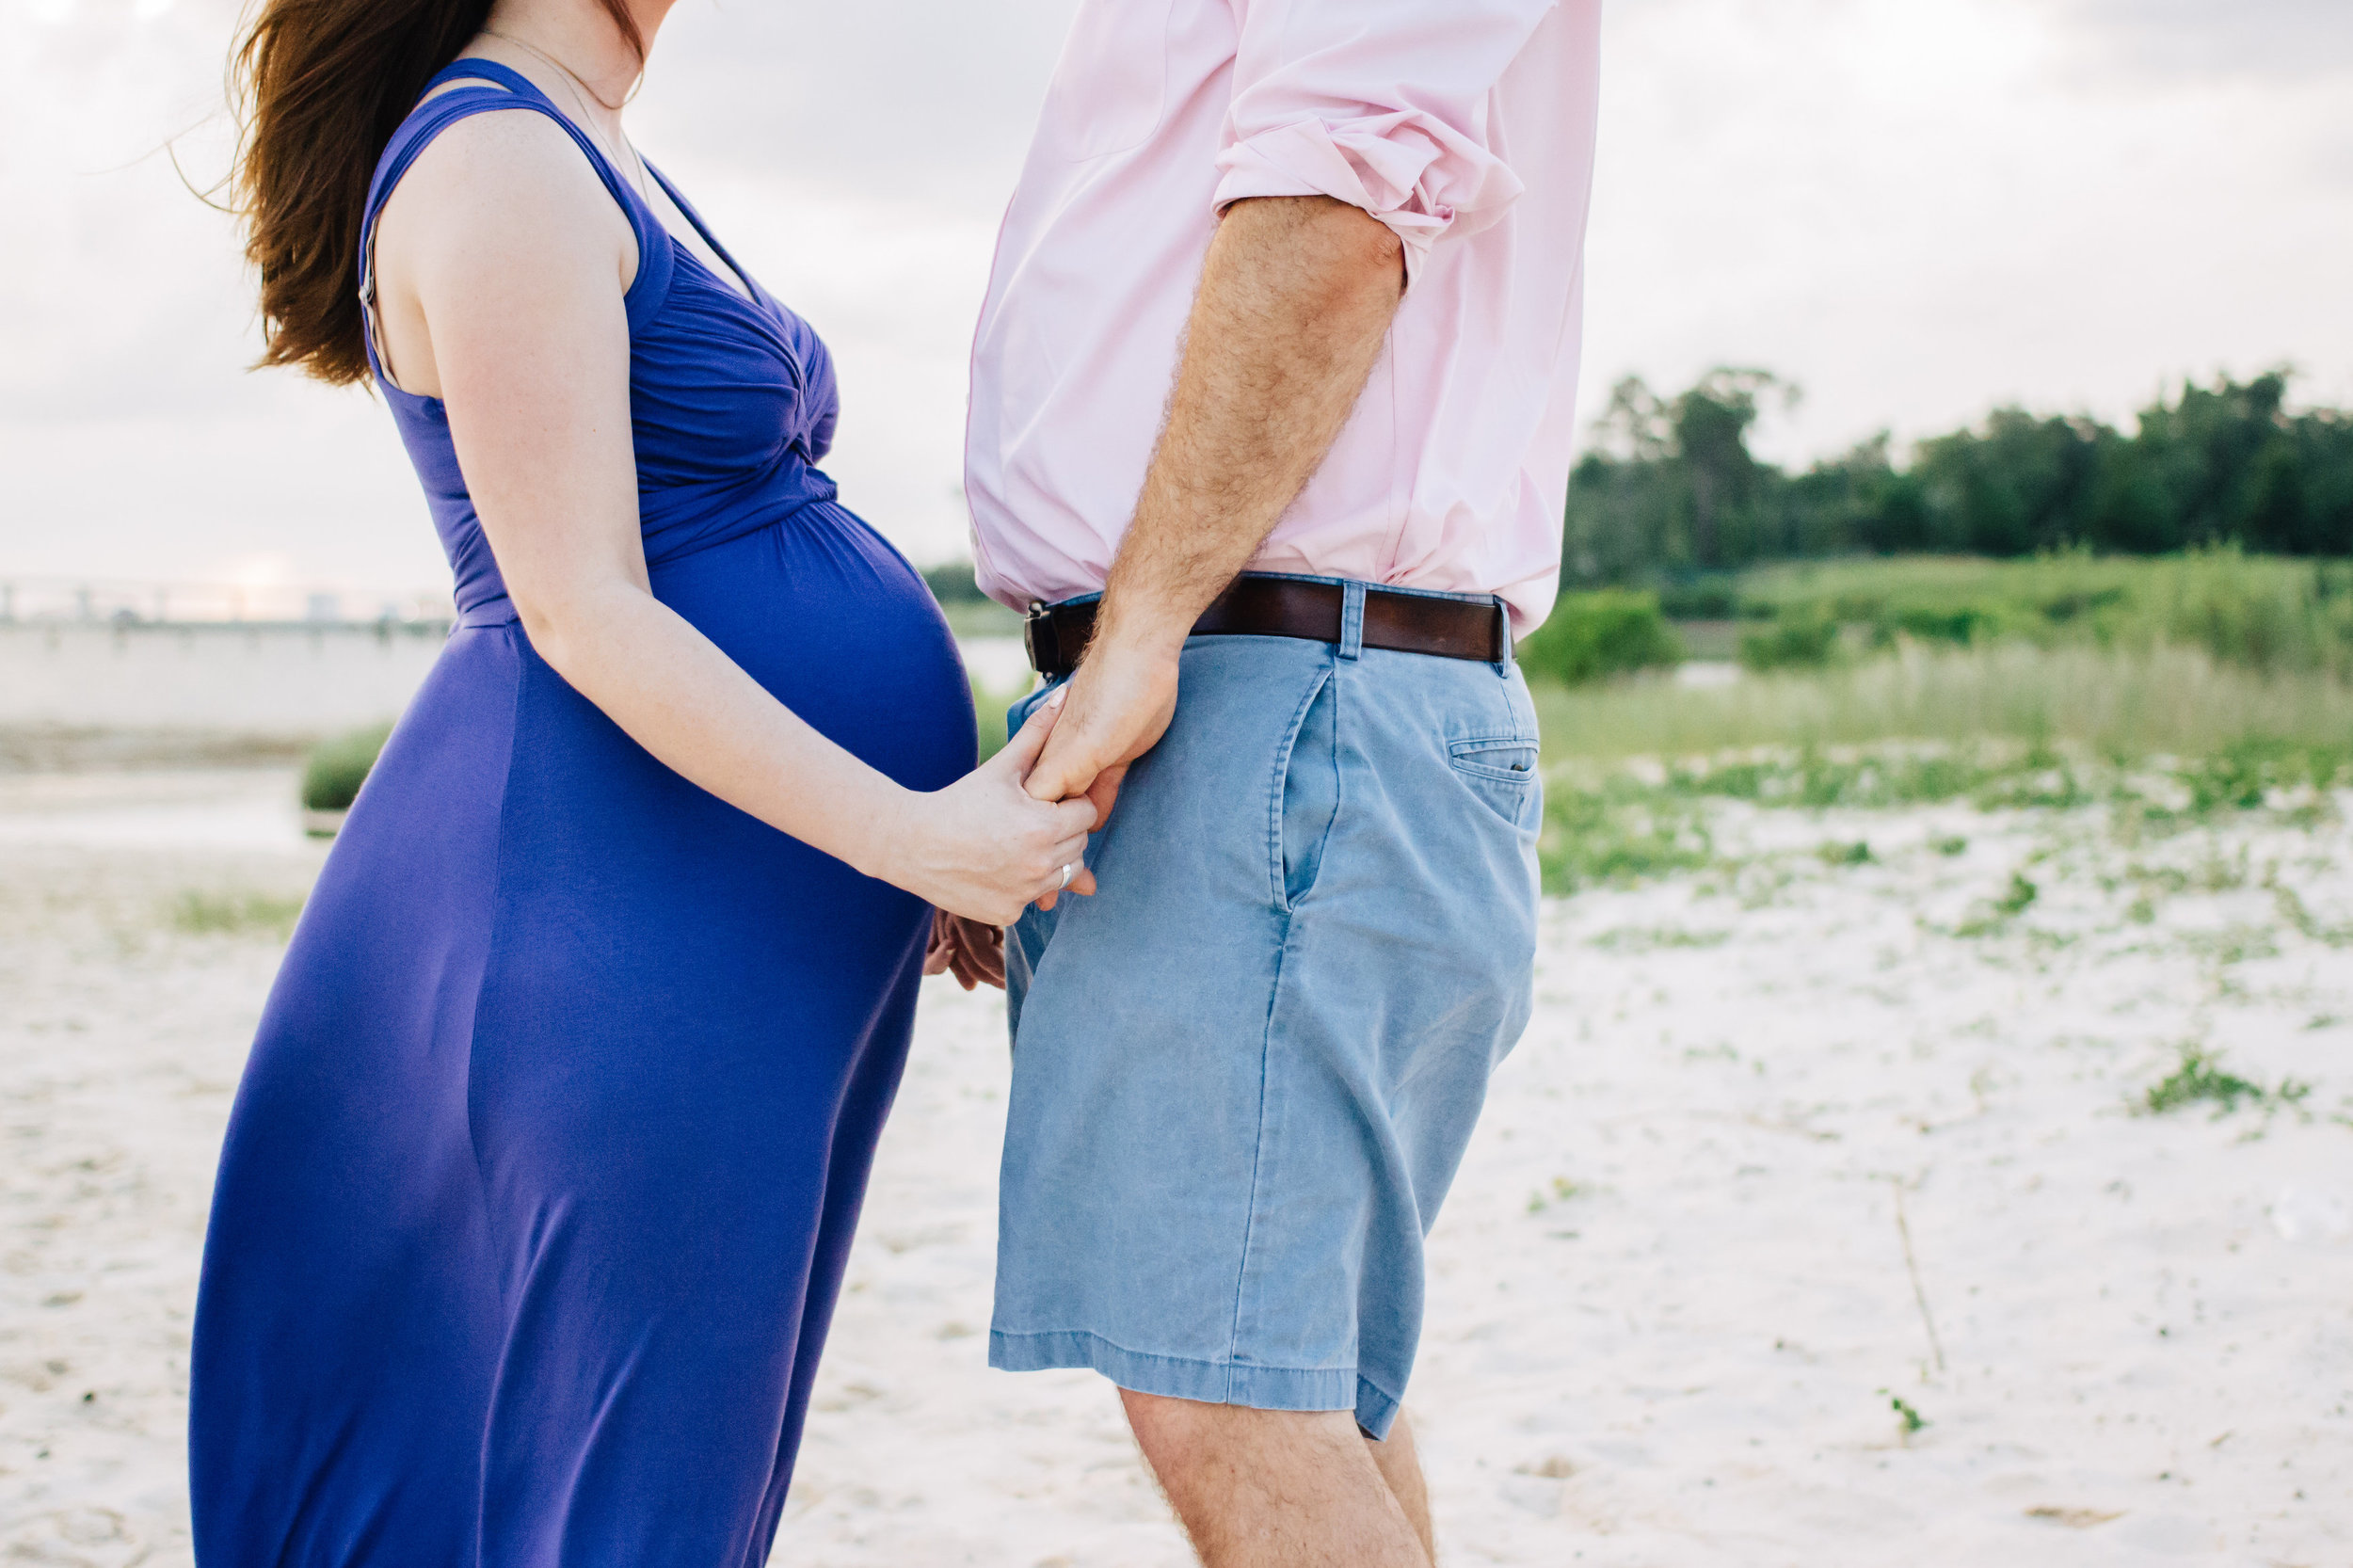 faceless maternity photo on beach